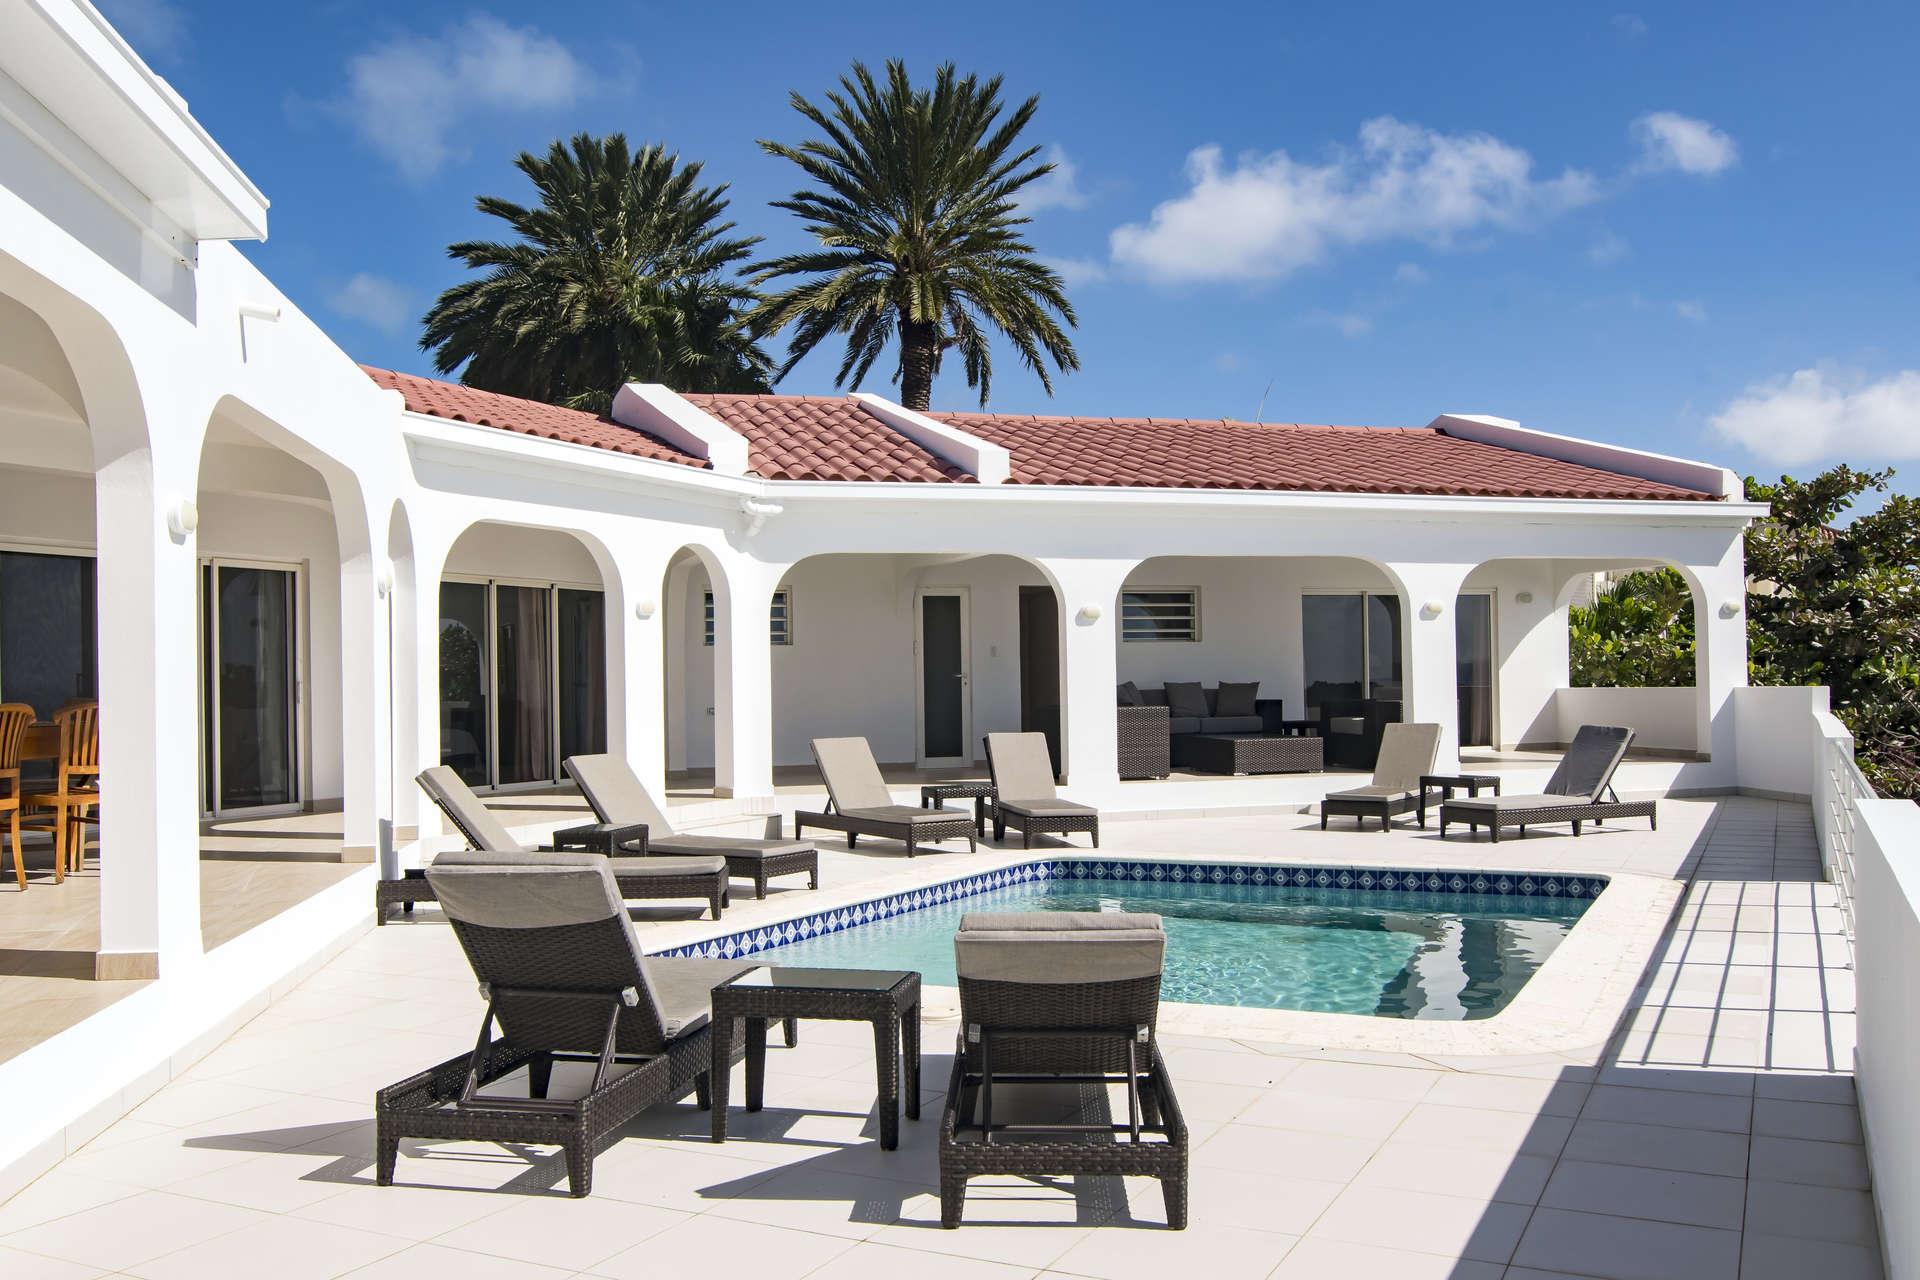 Luxury villa rentals caribbean - St martin - Sint maarten - Tamarind hill - Rising Star - Image 1/17